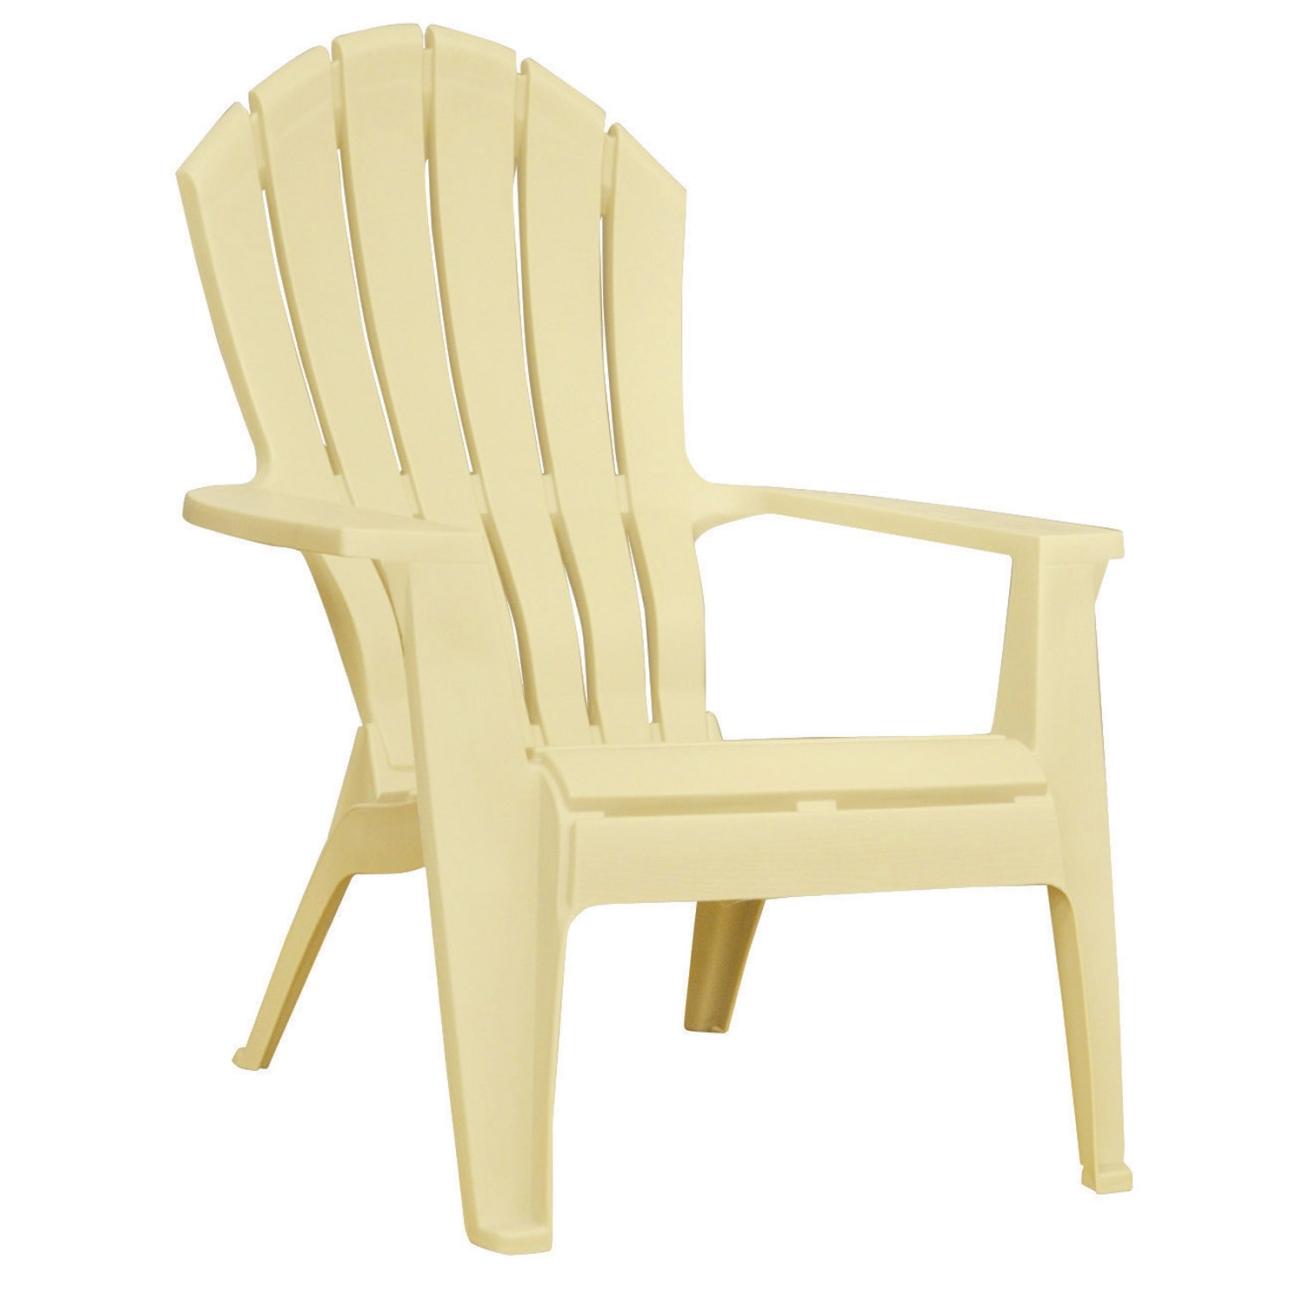 plastic adirondack chairs adams realcomfort adirondack chair 1 pc. yellow (8371-10-3700) - OUJKLTZ